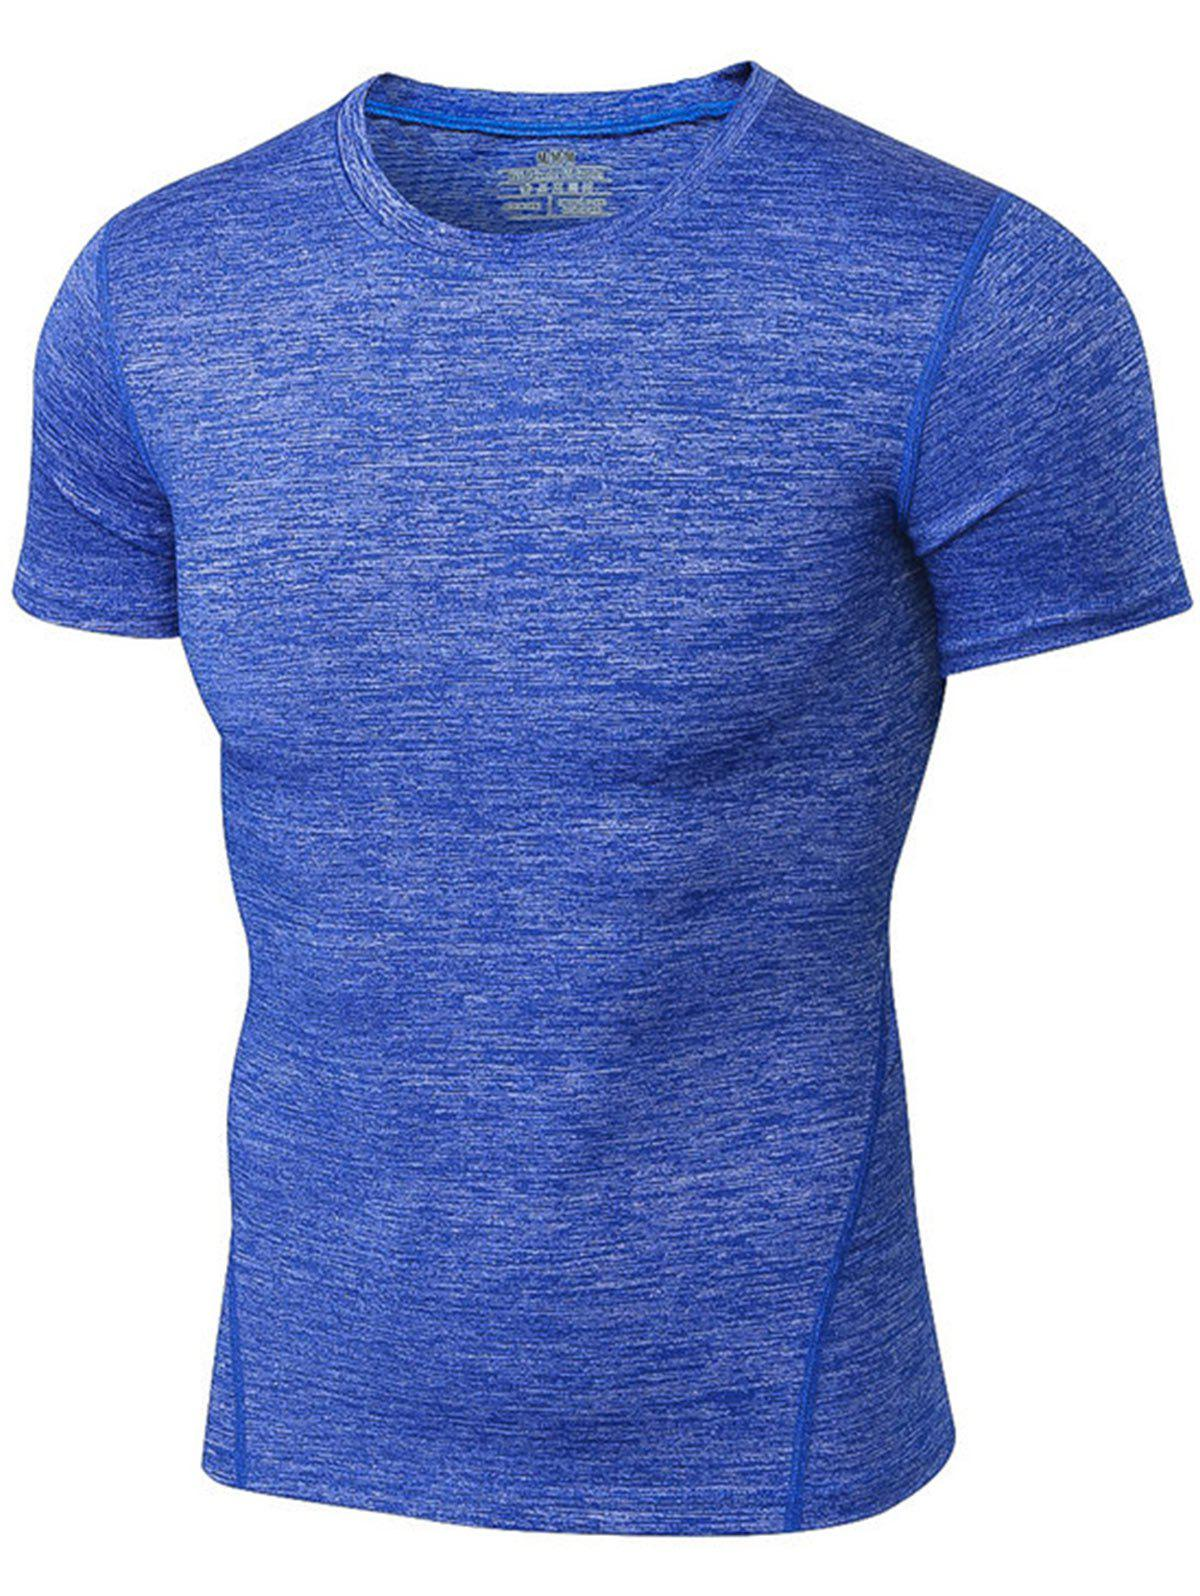 Space Dye Short Sleeve Activewear 214282505